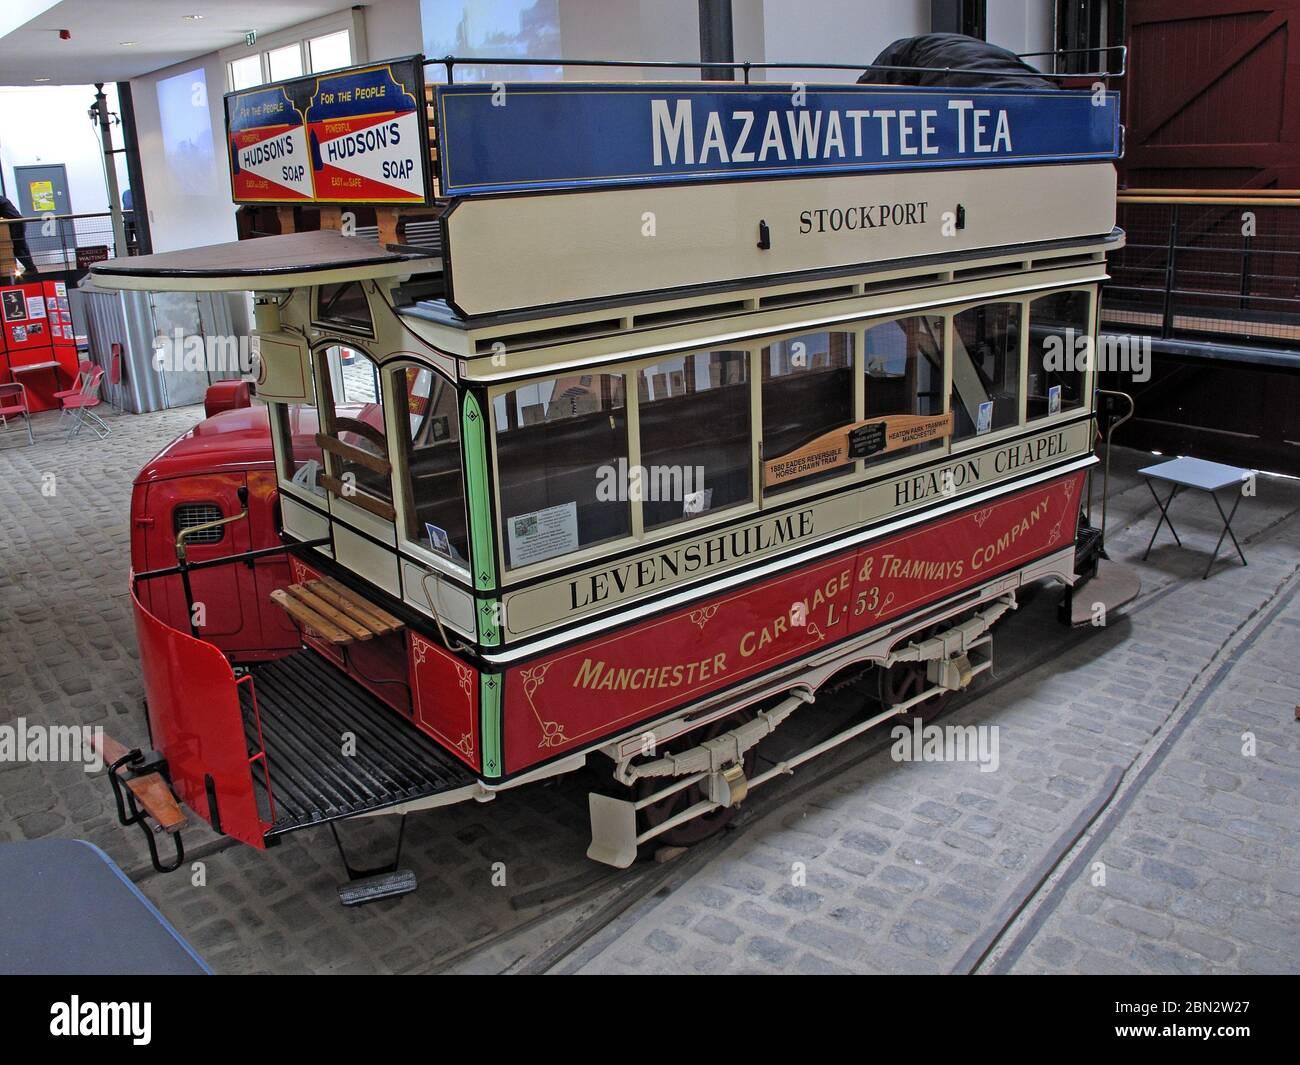 Dieses Stockfoto: Levenshulme Straßenbahn, Heaton Chapel, Stockport, 192,192 Bus, 192 Straßenbahn, Mazawattee Tee, Hudsons Seife, Manchester Carriage & Tramways Company - 2BN2W2